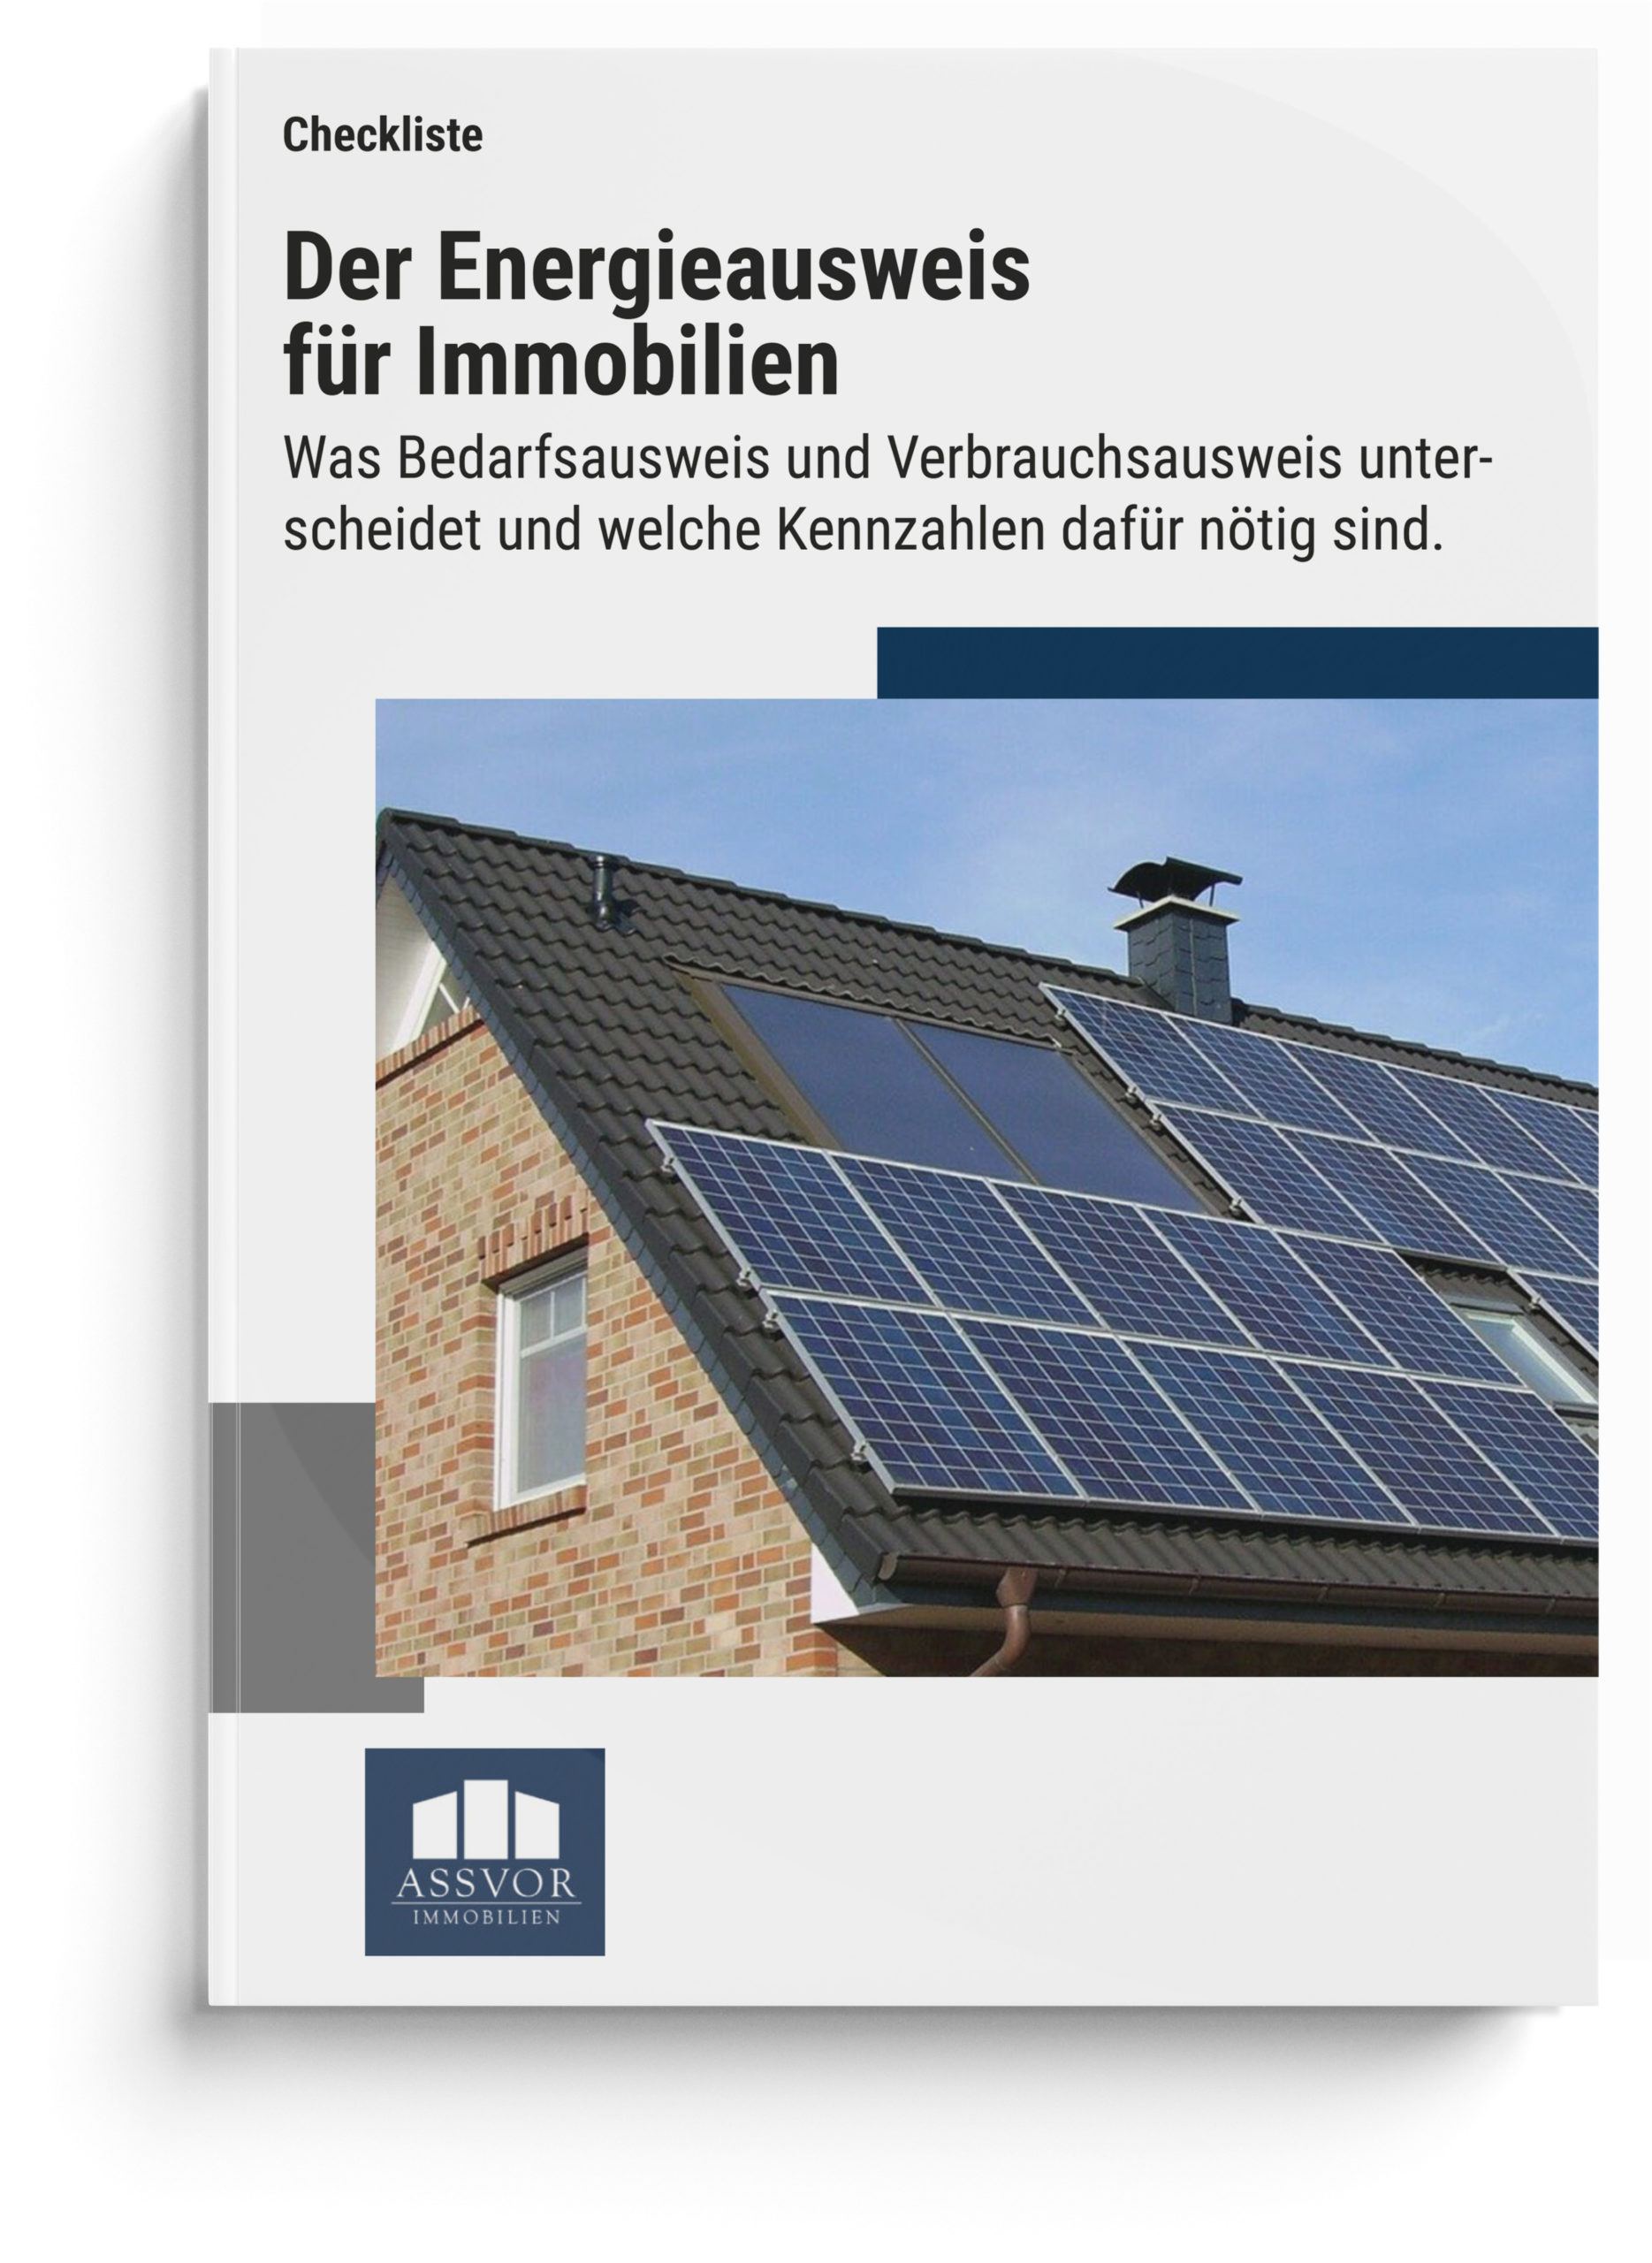 Ratgeber Mockup Bedarfsausweis Verbrauschsausweis Kennzahlen Energie Effizienz Effiziensklasse Energieeffiziensklasse Heizung Dämmung Gebäudeenergieausweis Energieausweis